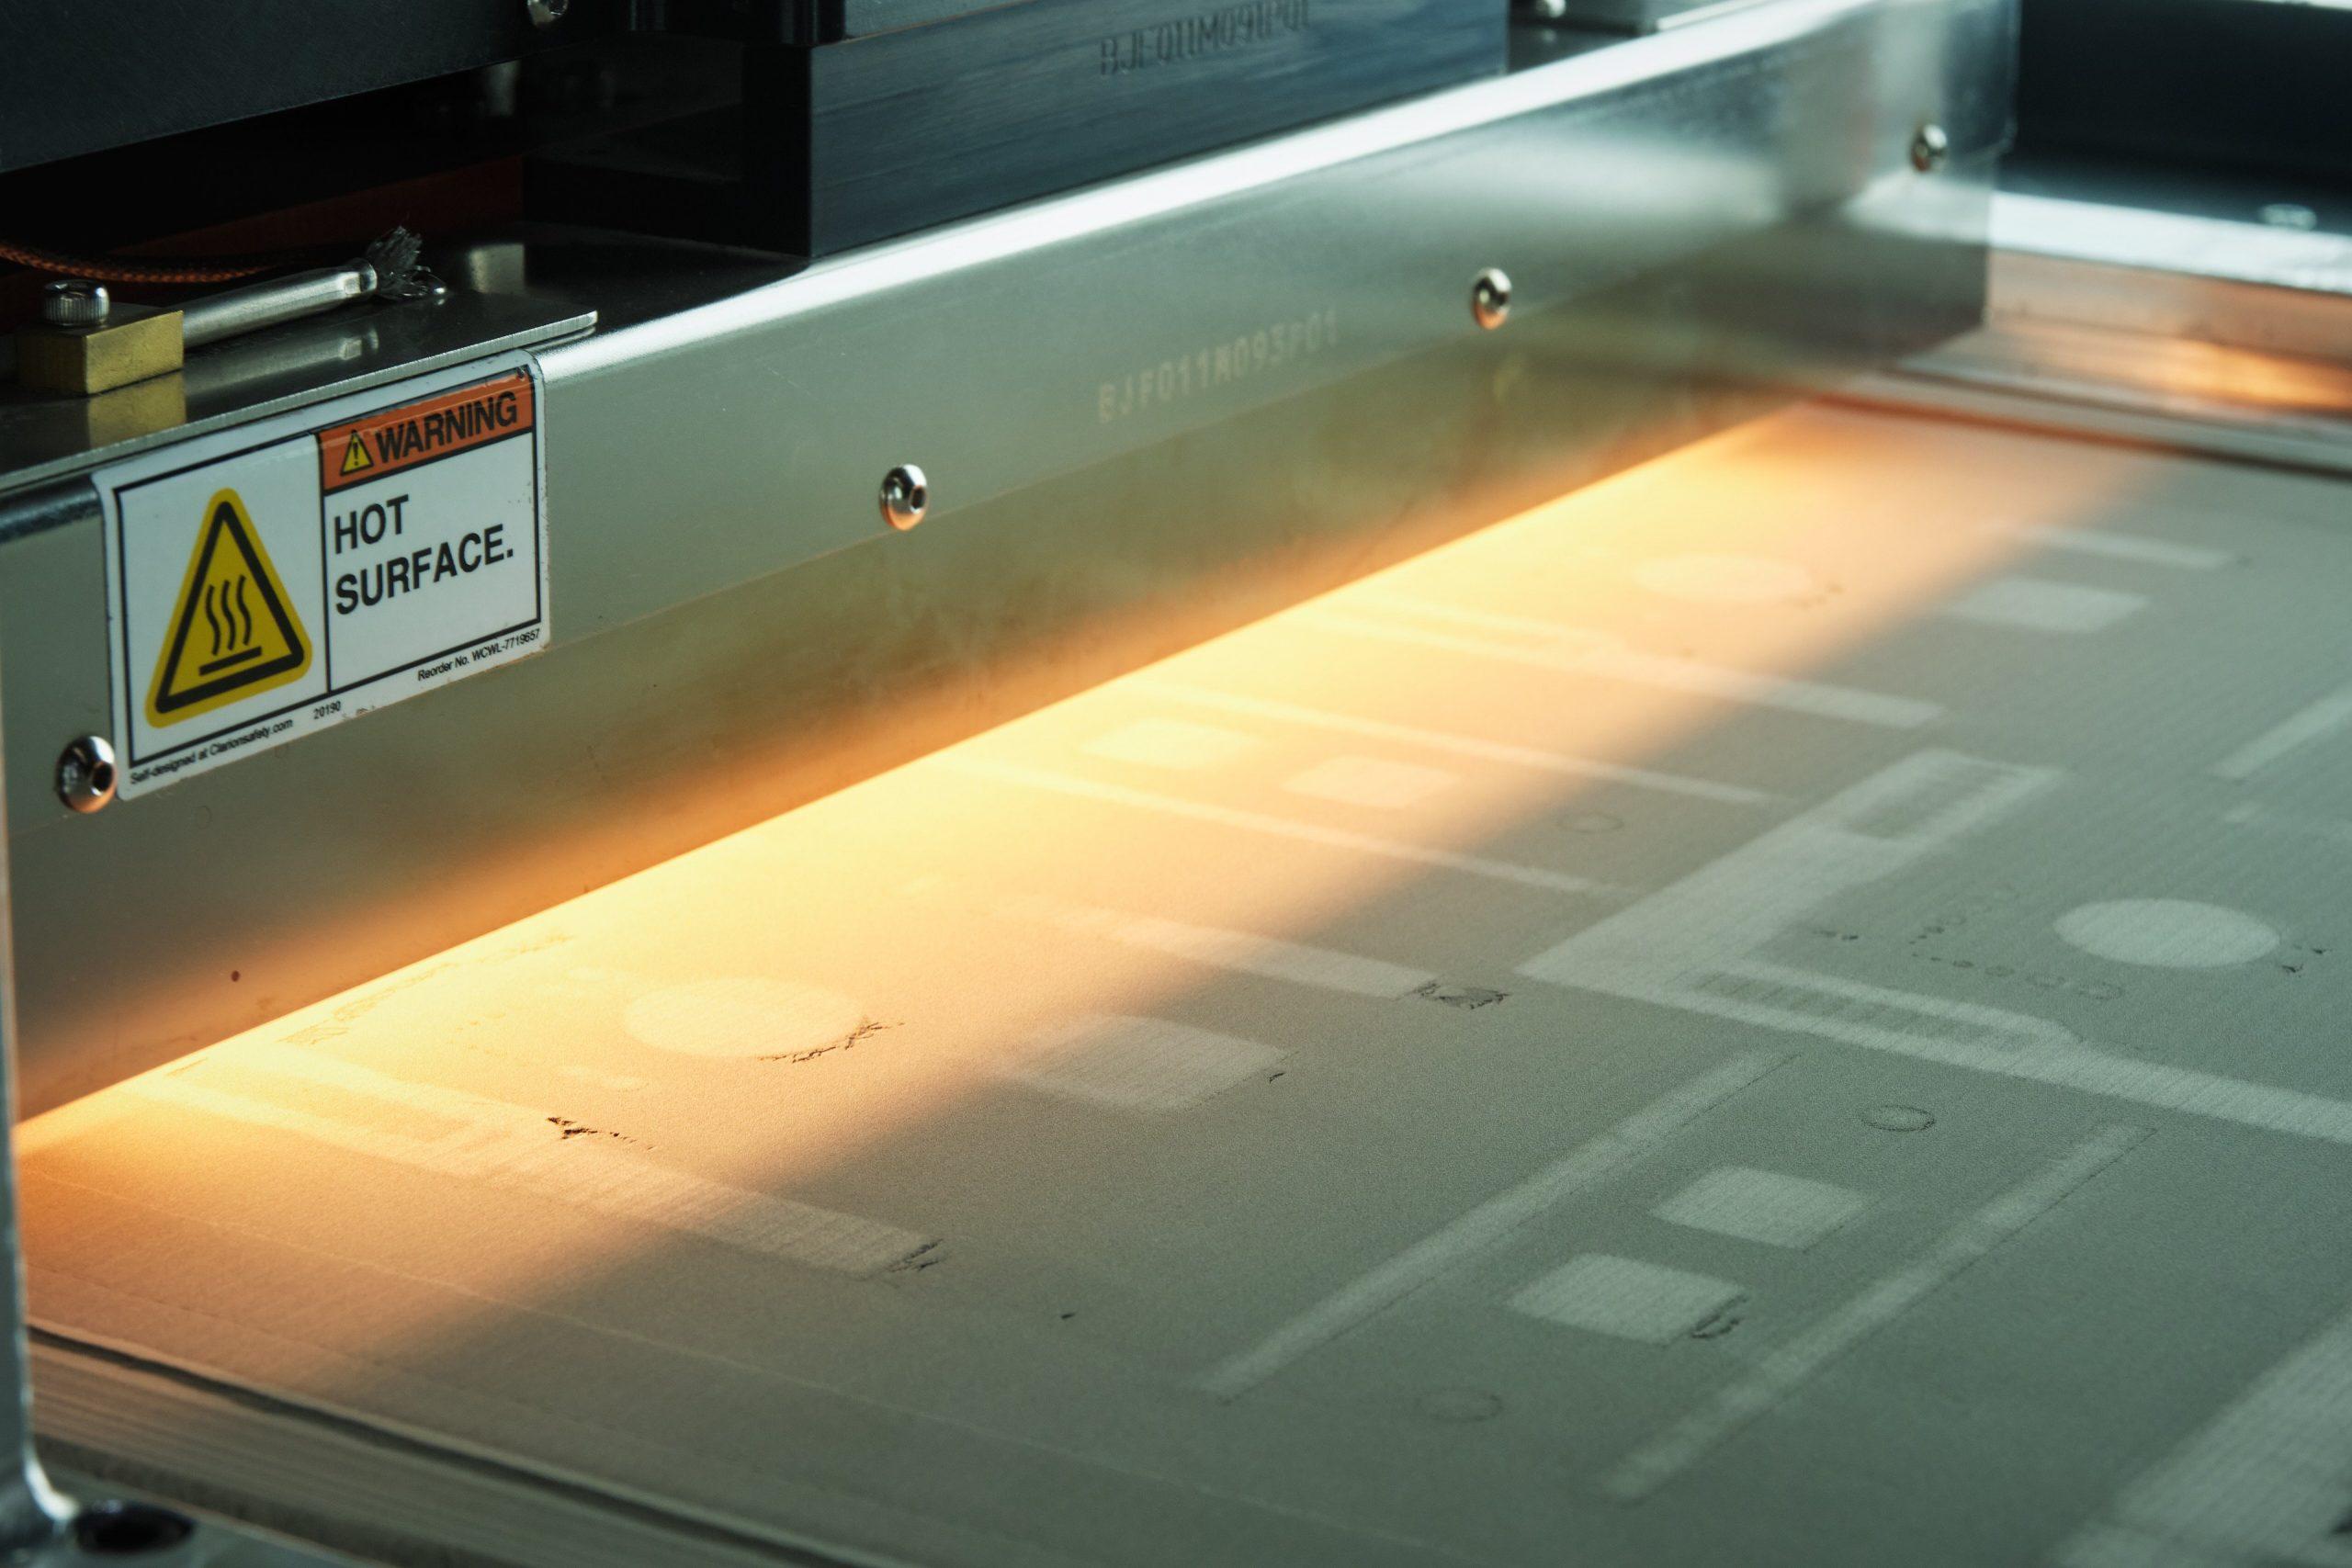 The binder jet 3D printing process on GE Additive's H2 machine. Photo via Cummins Inc.